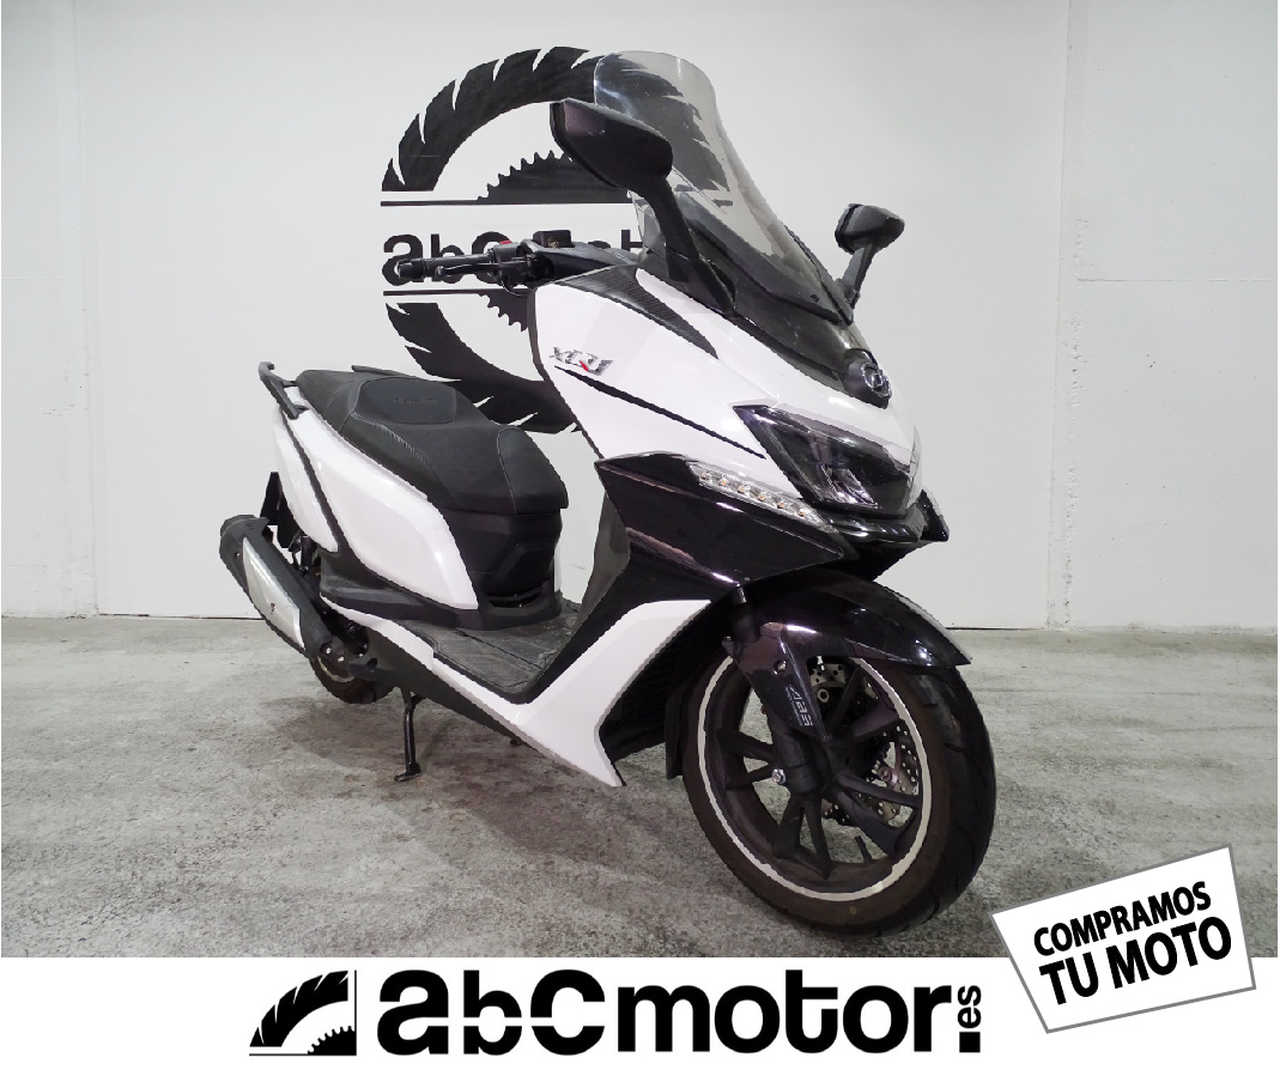 Daelim Otros  XQ1 125 ABS  - Foto 1